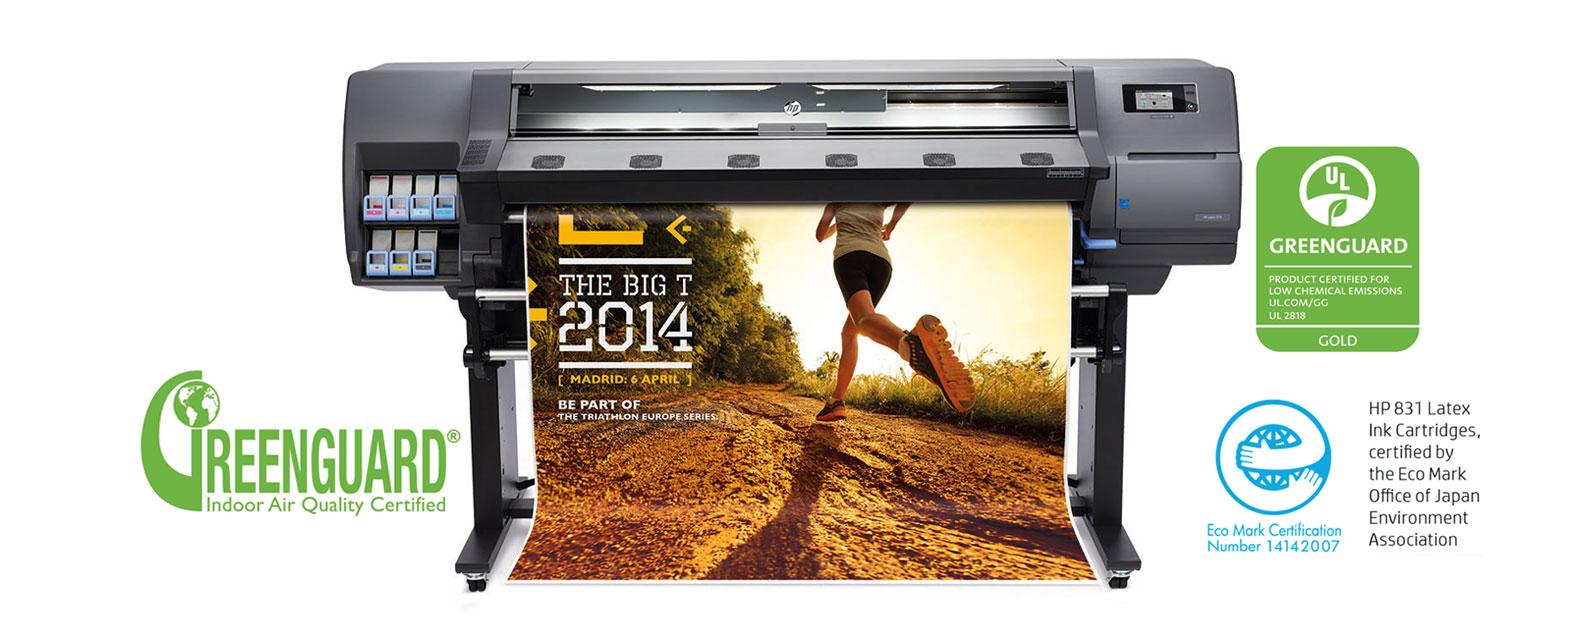 Brochure business card calendar canvas printing services previous next reheart Gallery